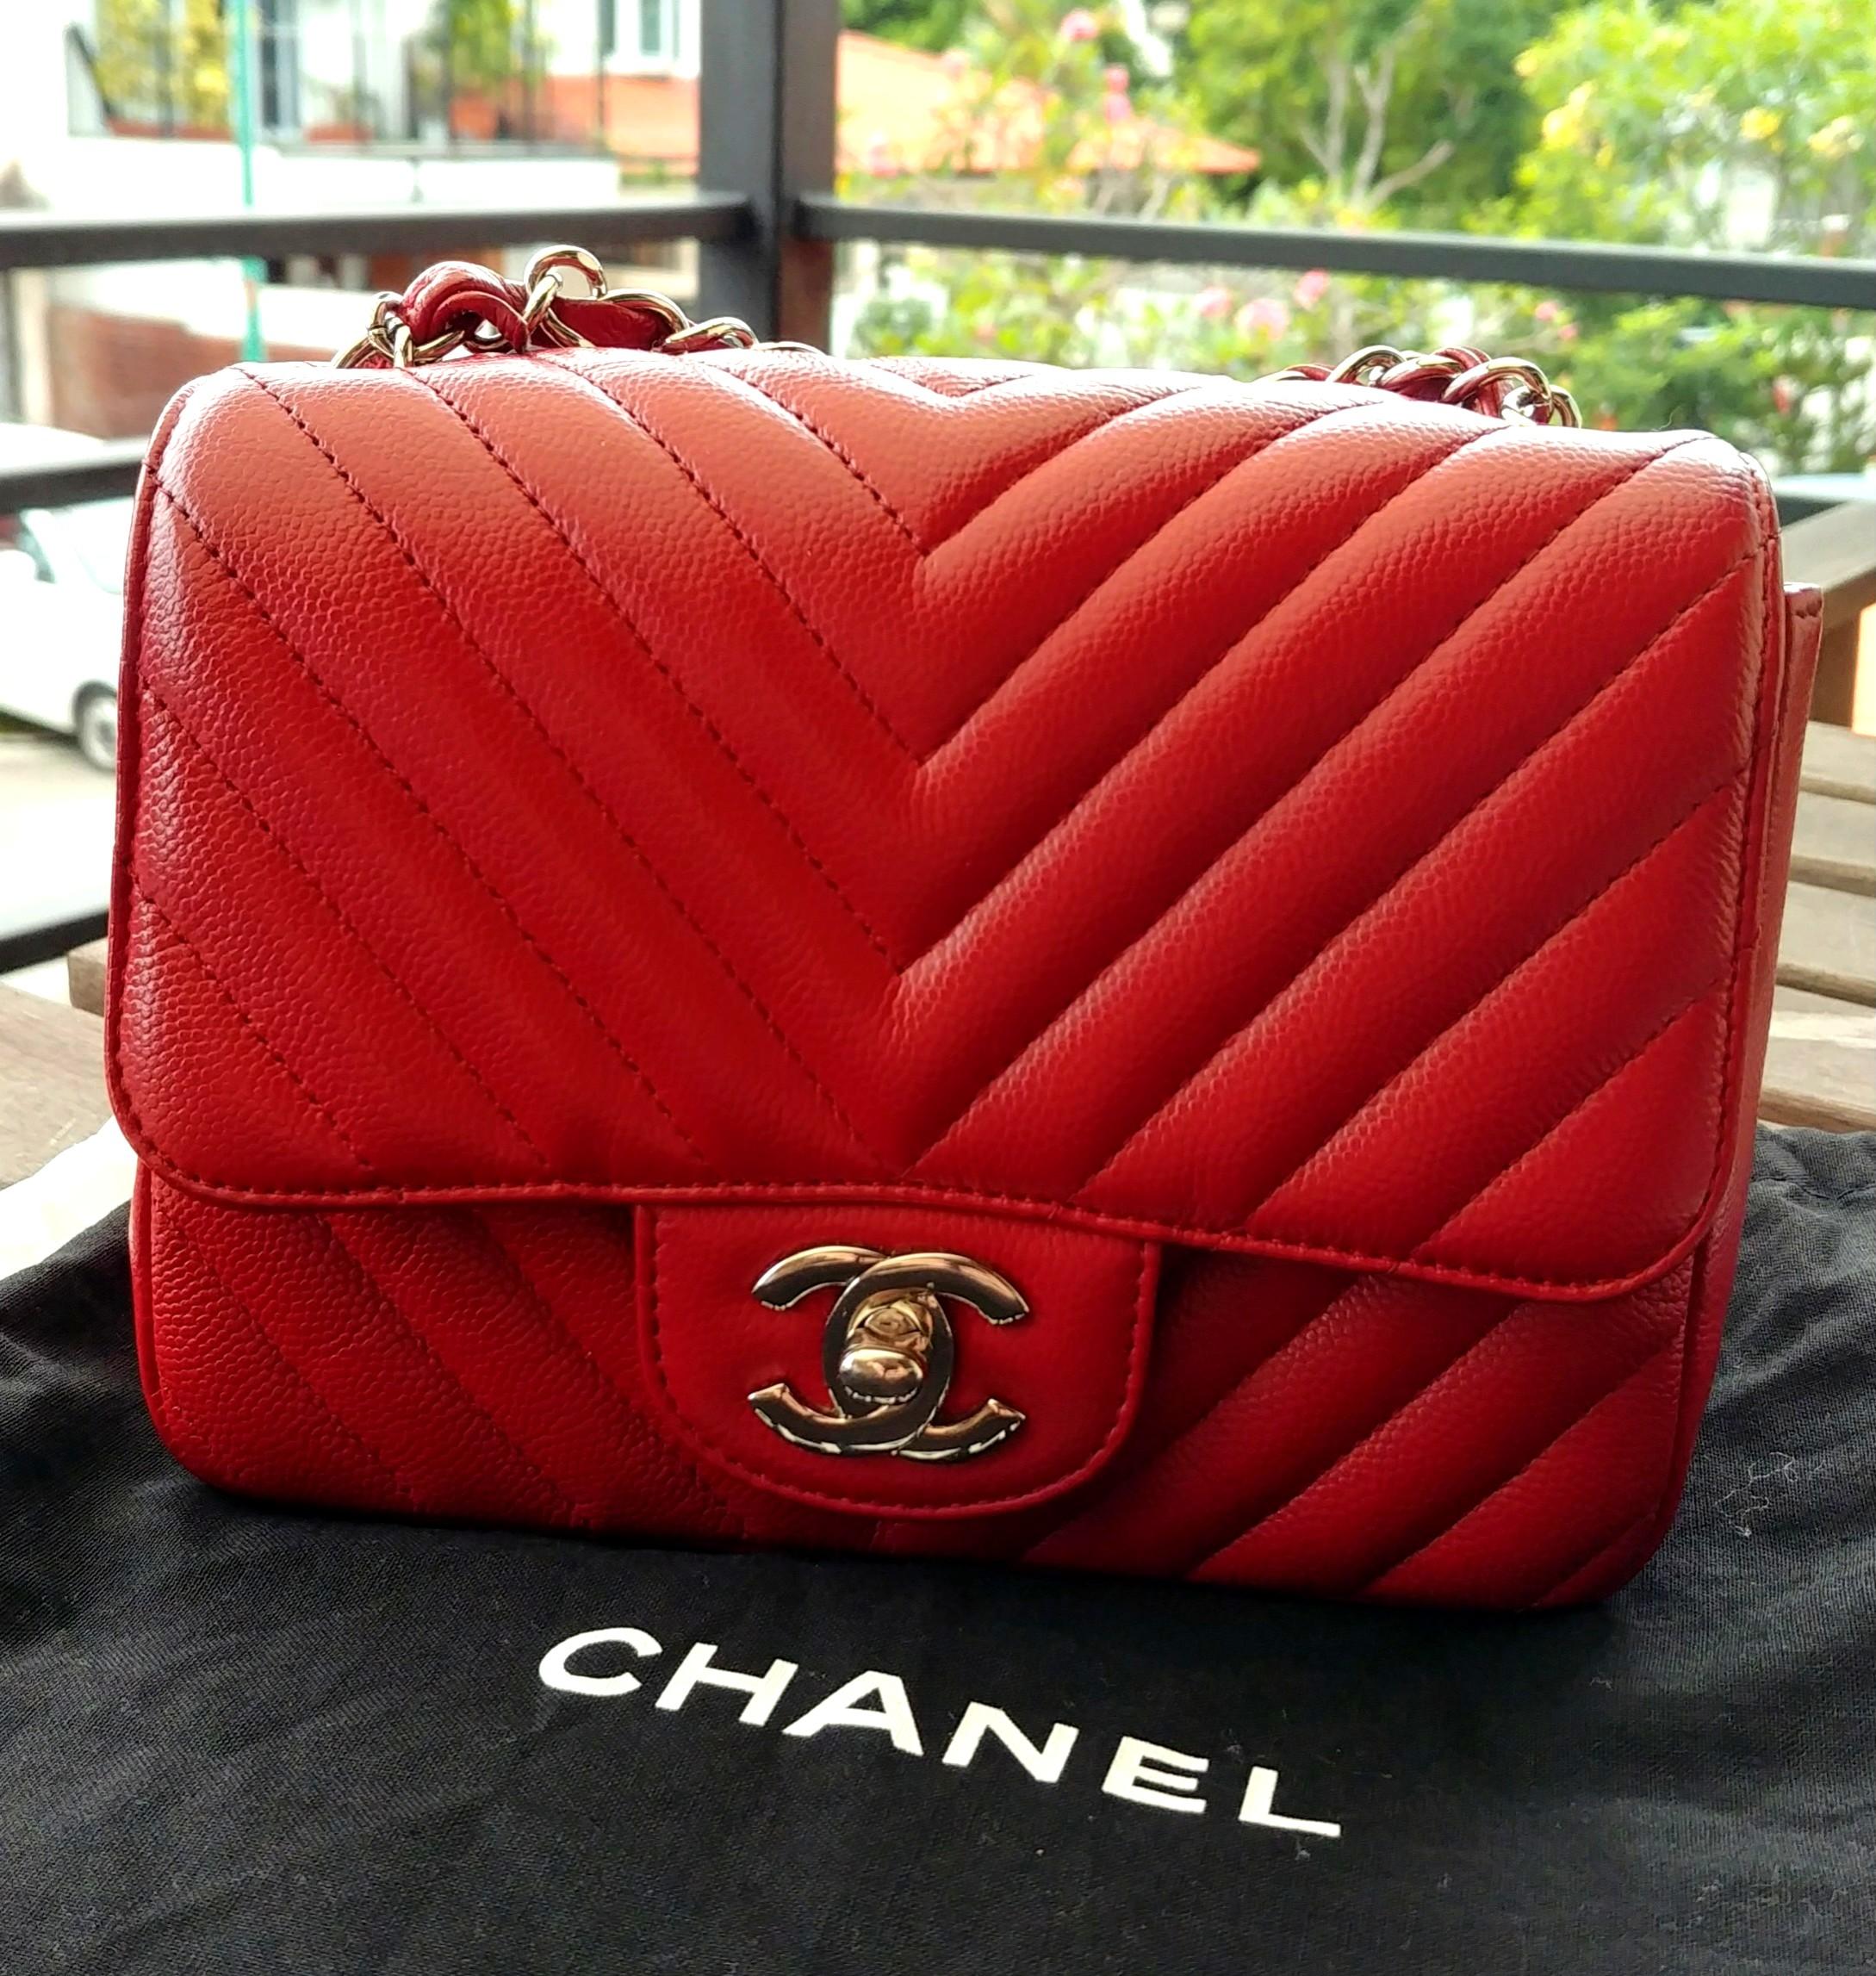 5bedb97ec50d Chanel Caviar Mini Flap Chevron Red, Women's Fashion, Bags & Wallets,  Handbags on Carousell